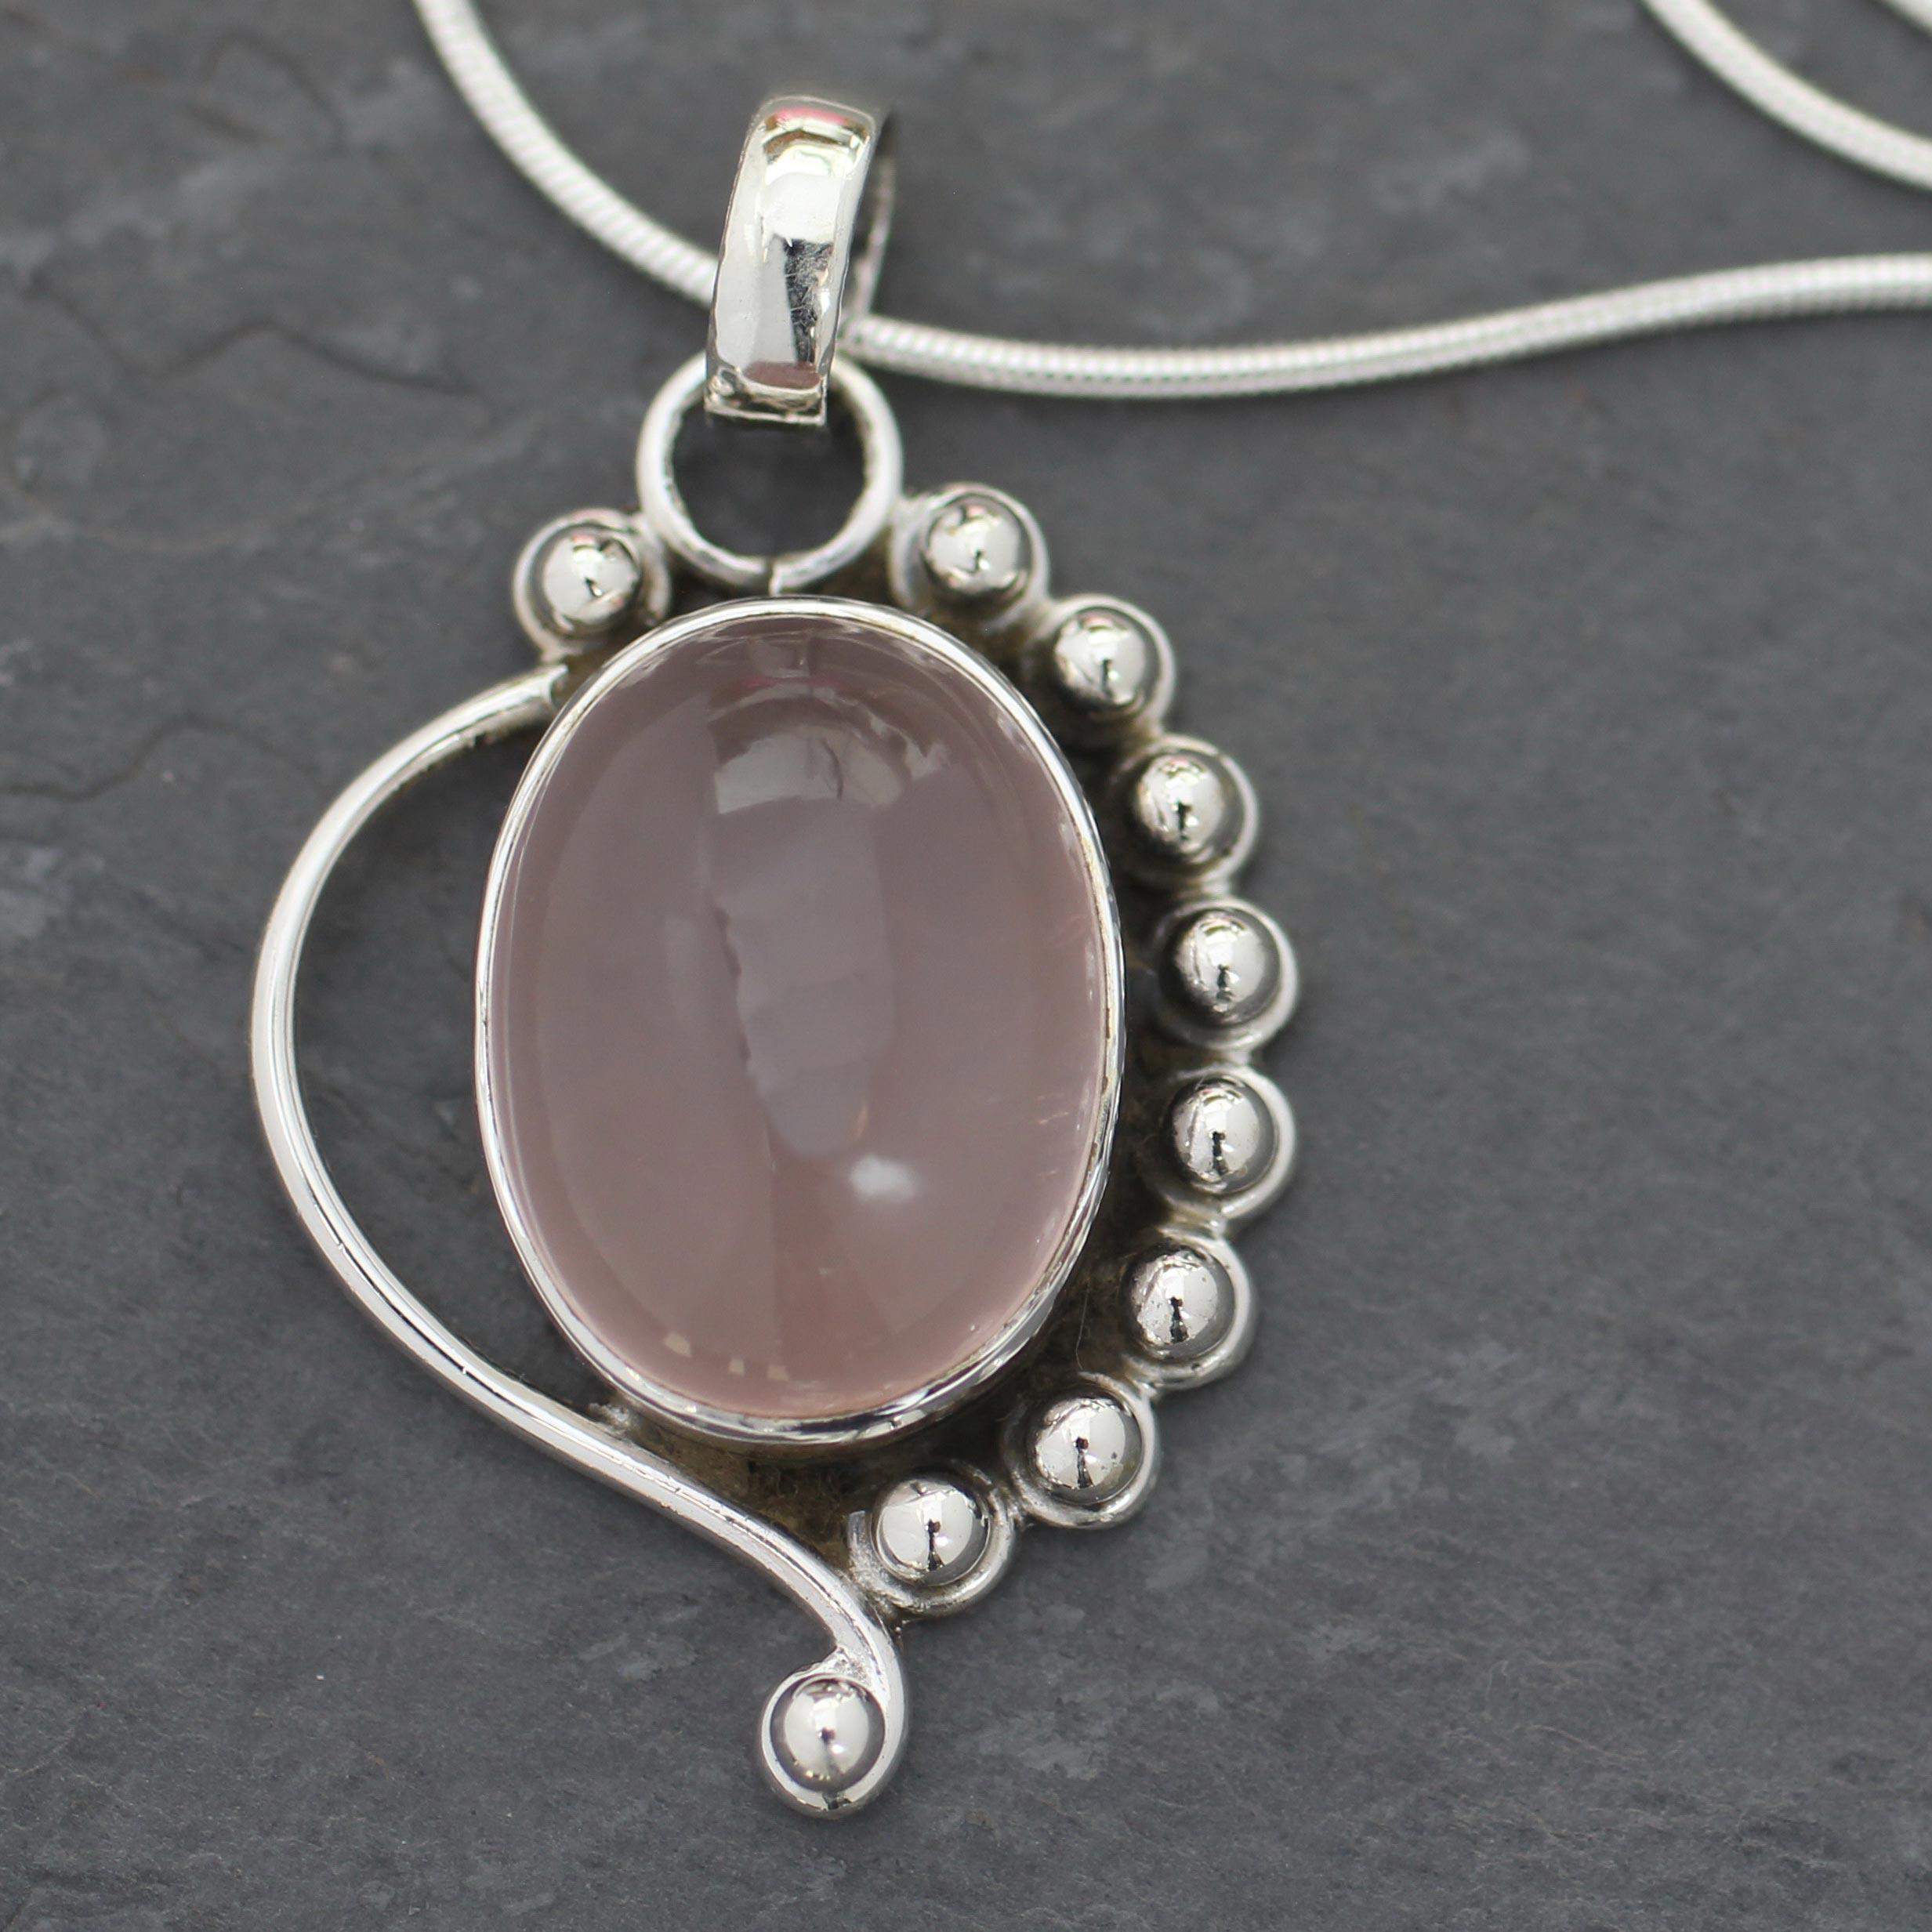 Rose Quartz Necklace Quartz Crystal Necklace Silver Rose Quartz Necklace